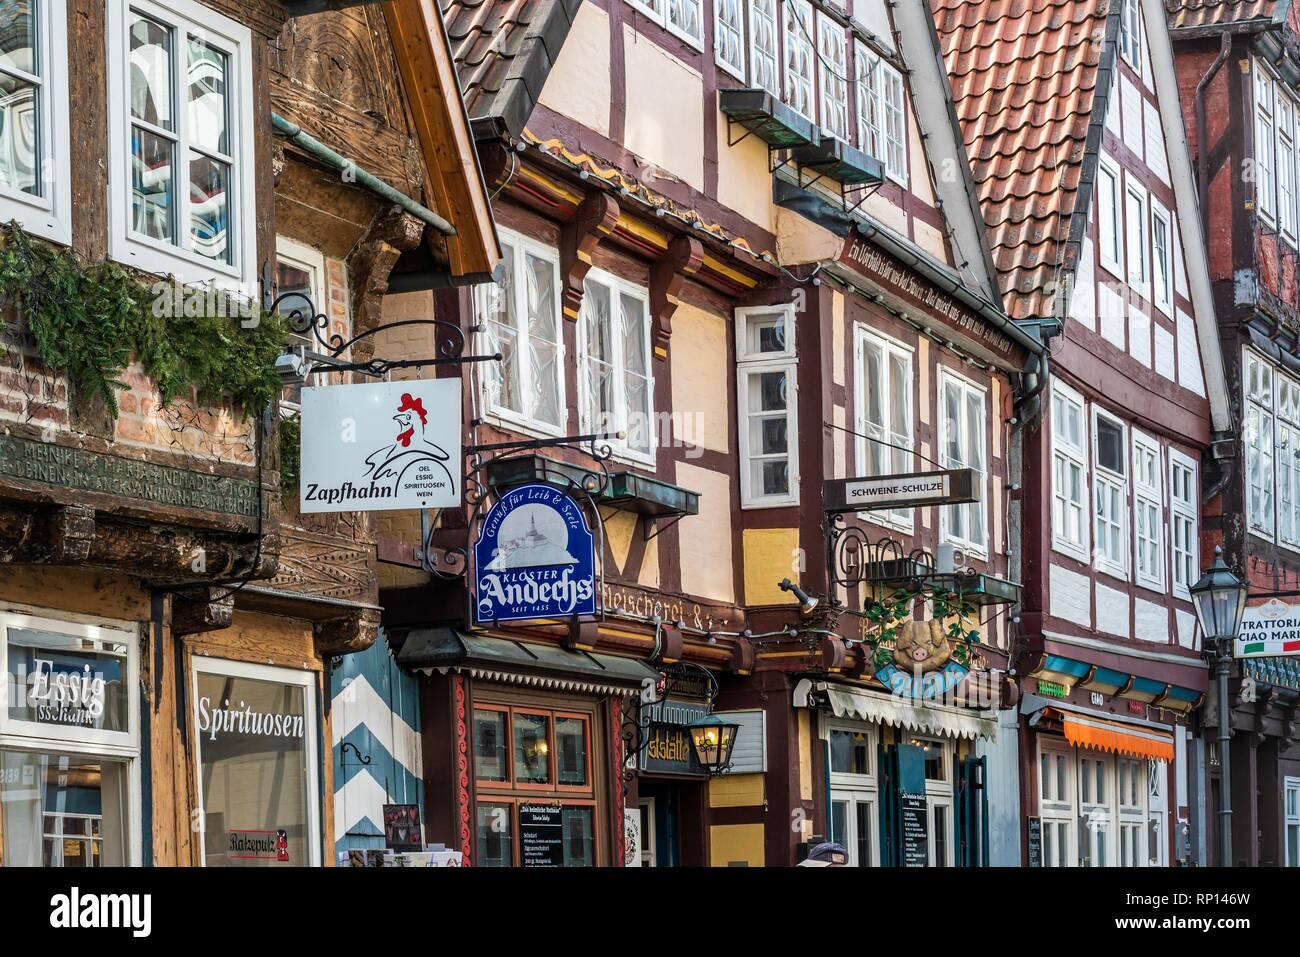 Fachwerkhäuser in der Celler Altstadt - Stock Image